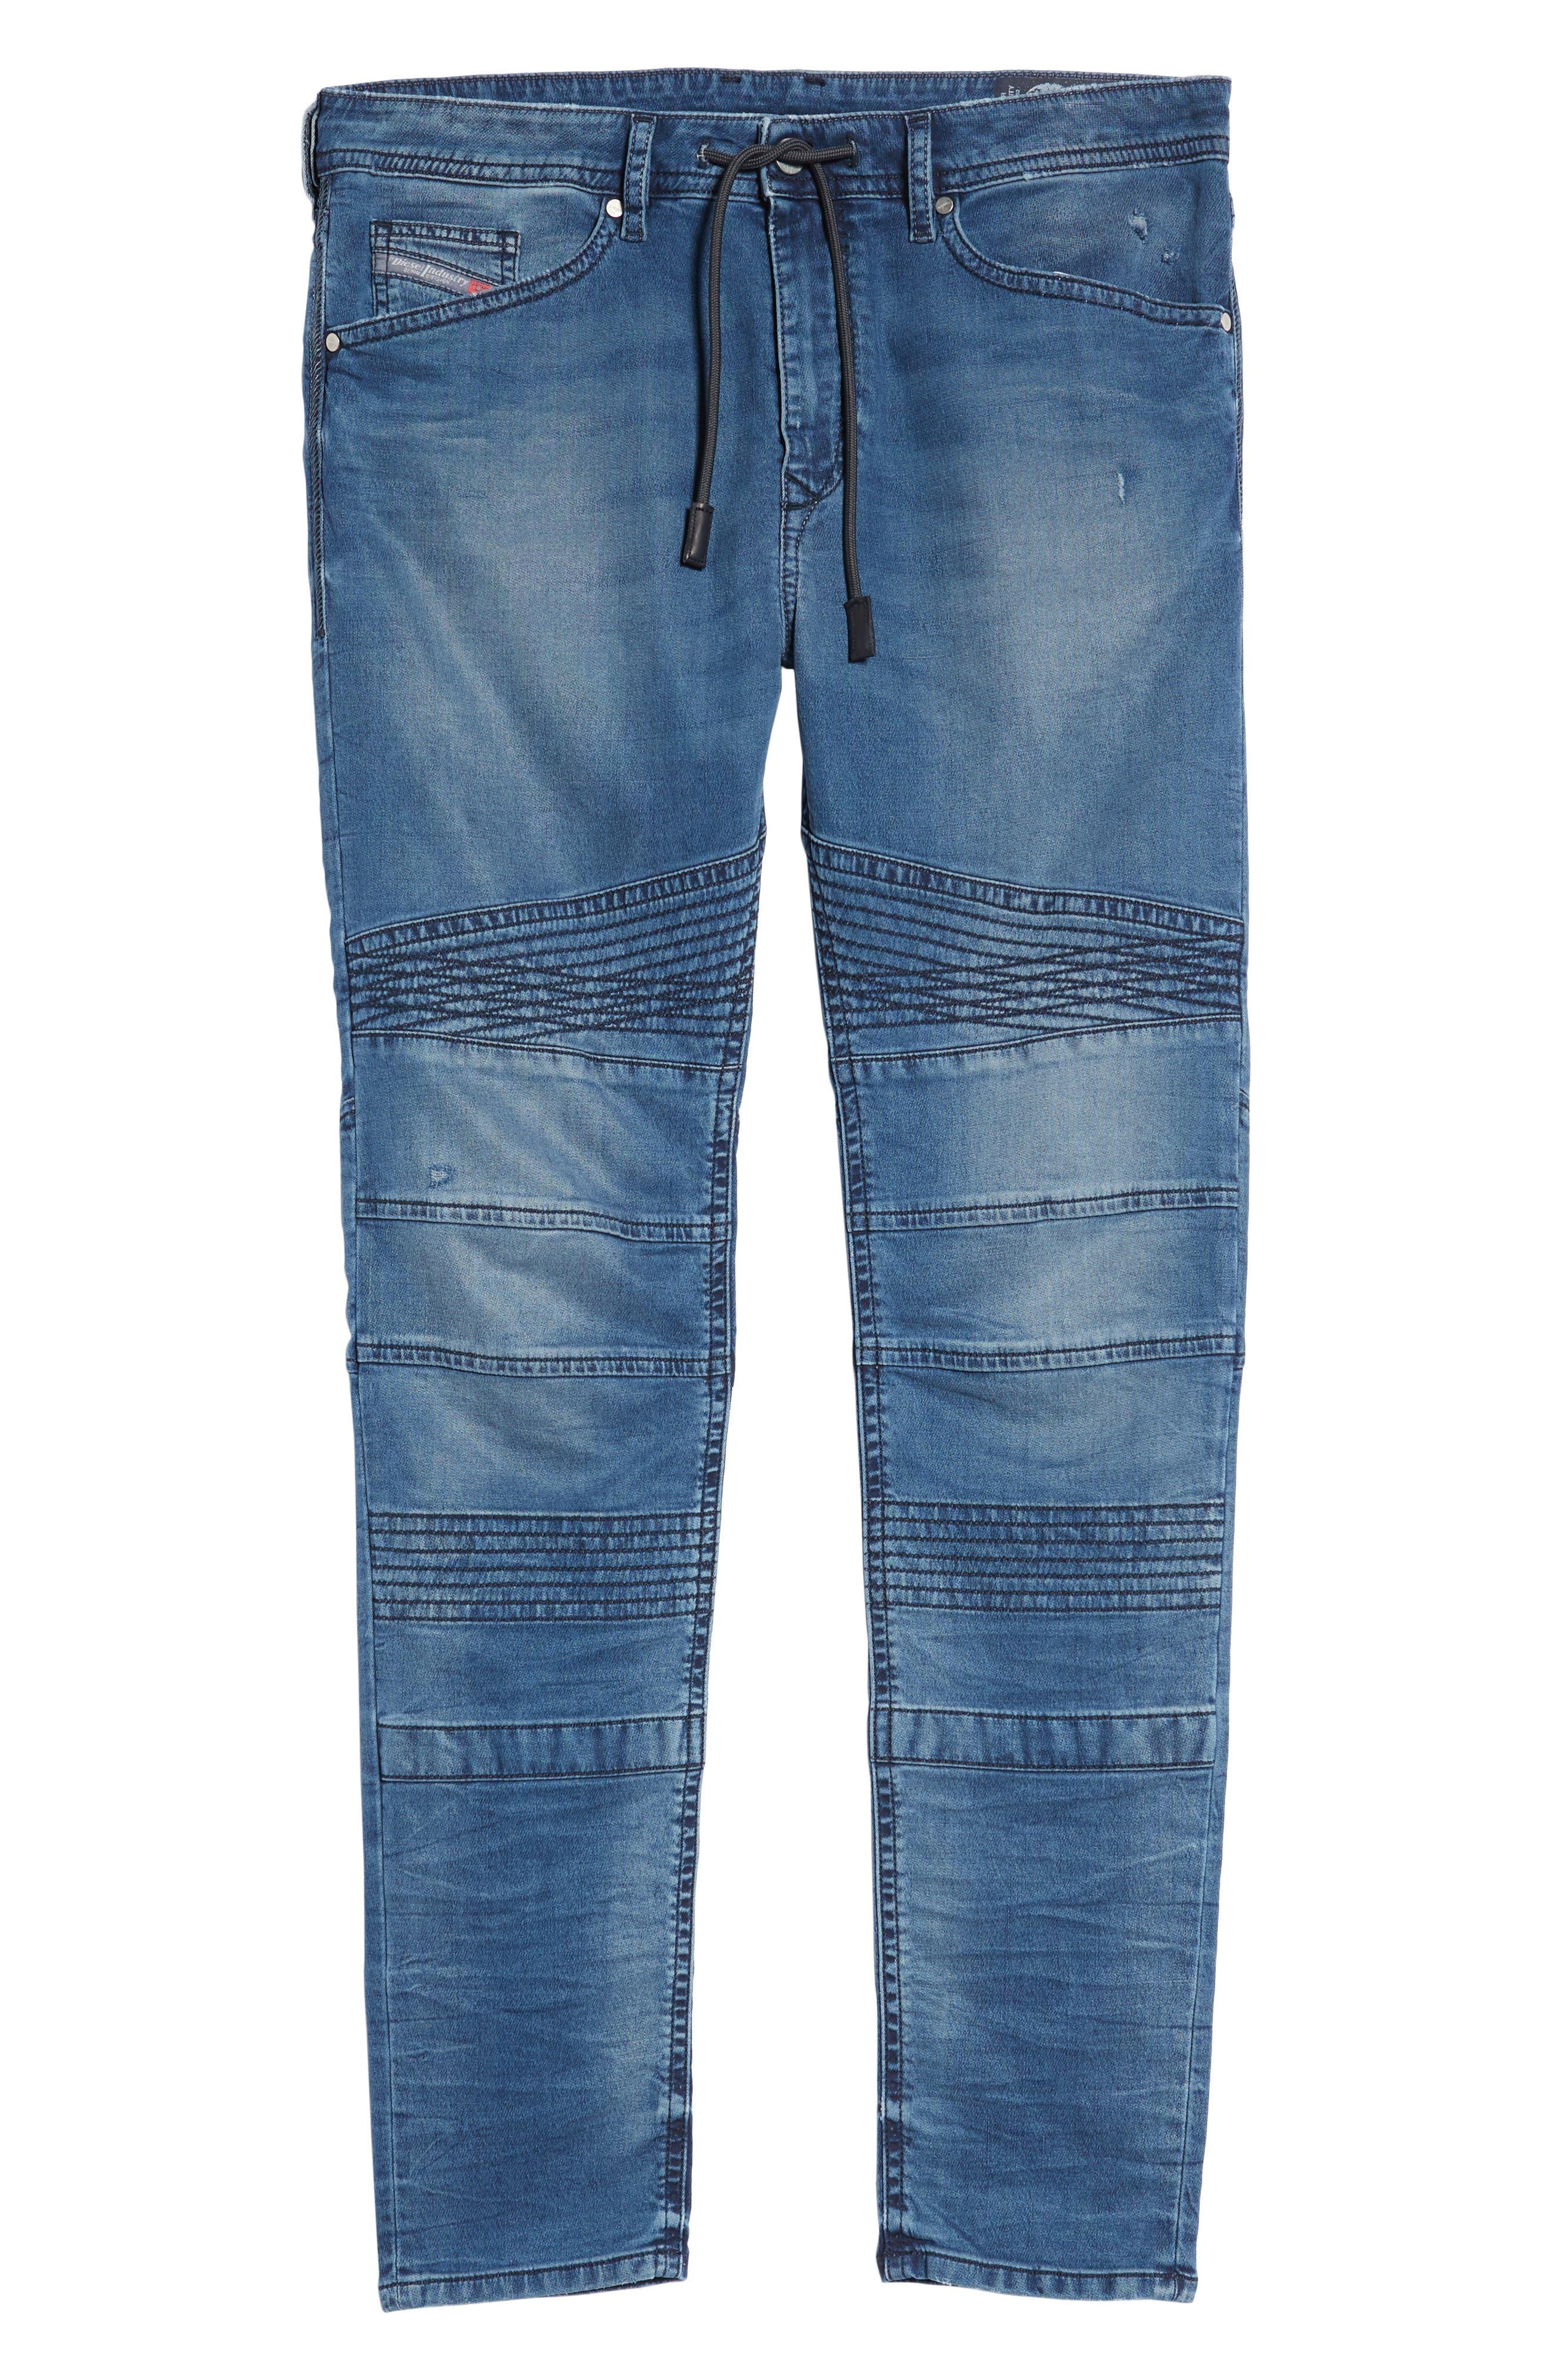 Bakari Skinny Fit Jeans,                             Alternate thumbnail 6, color,                             400